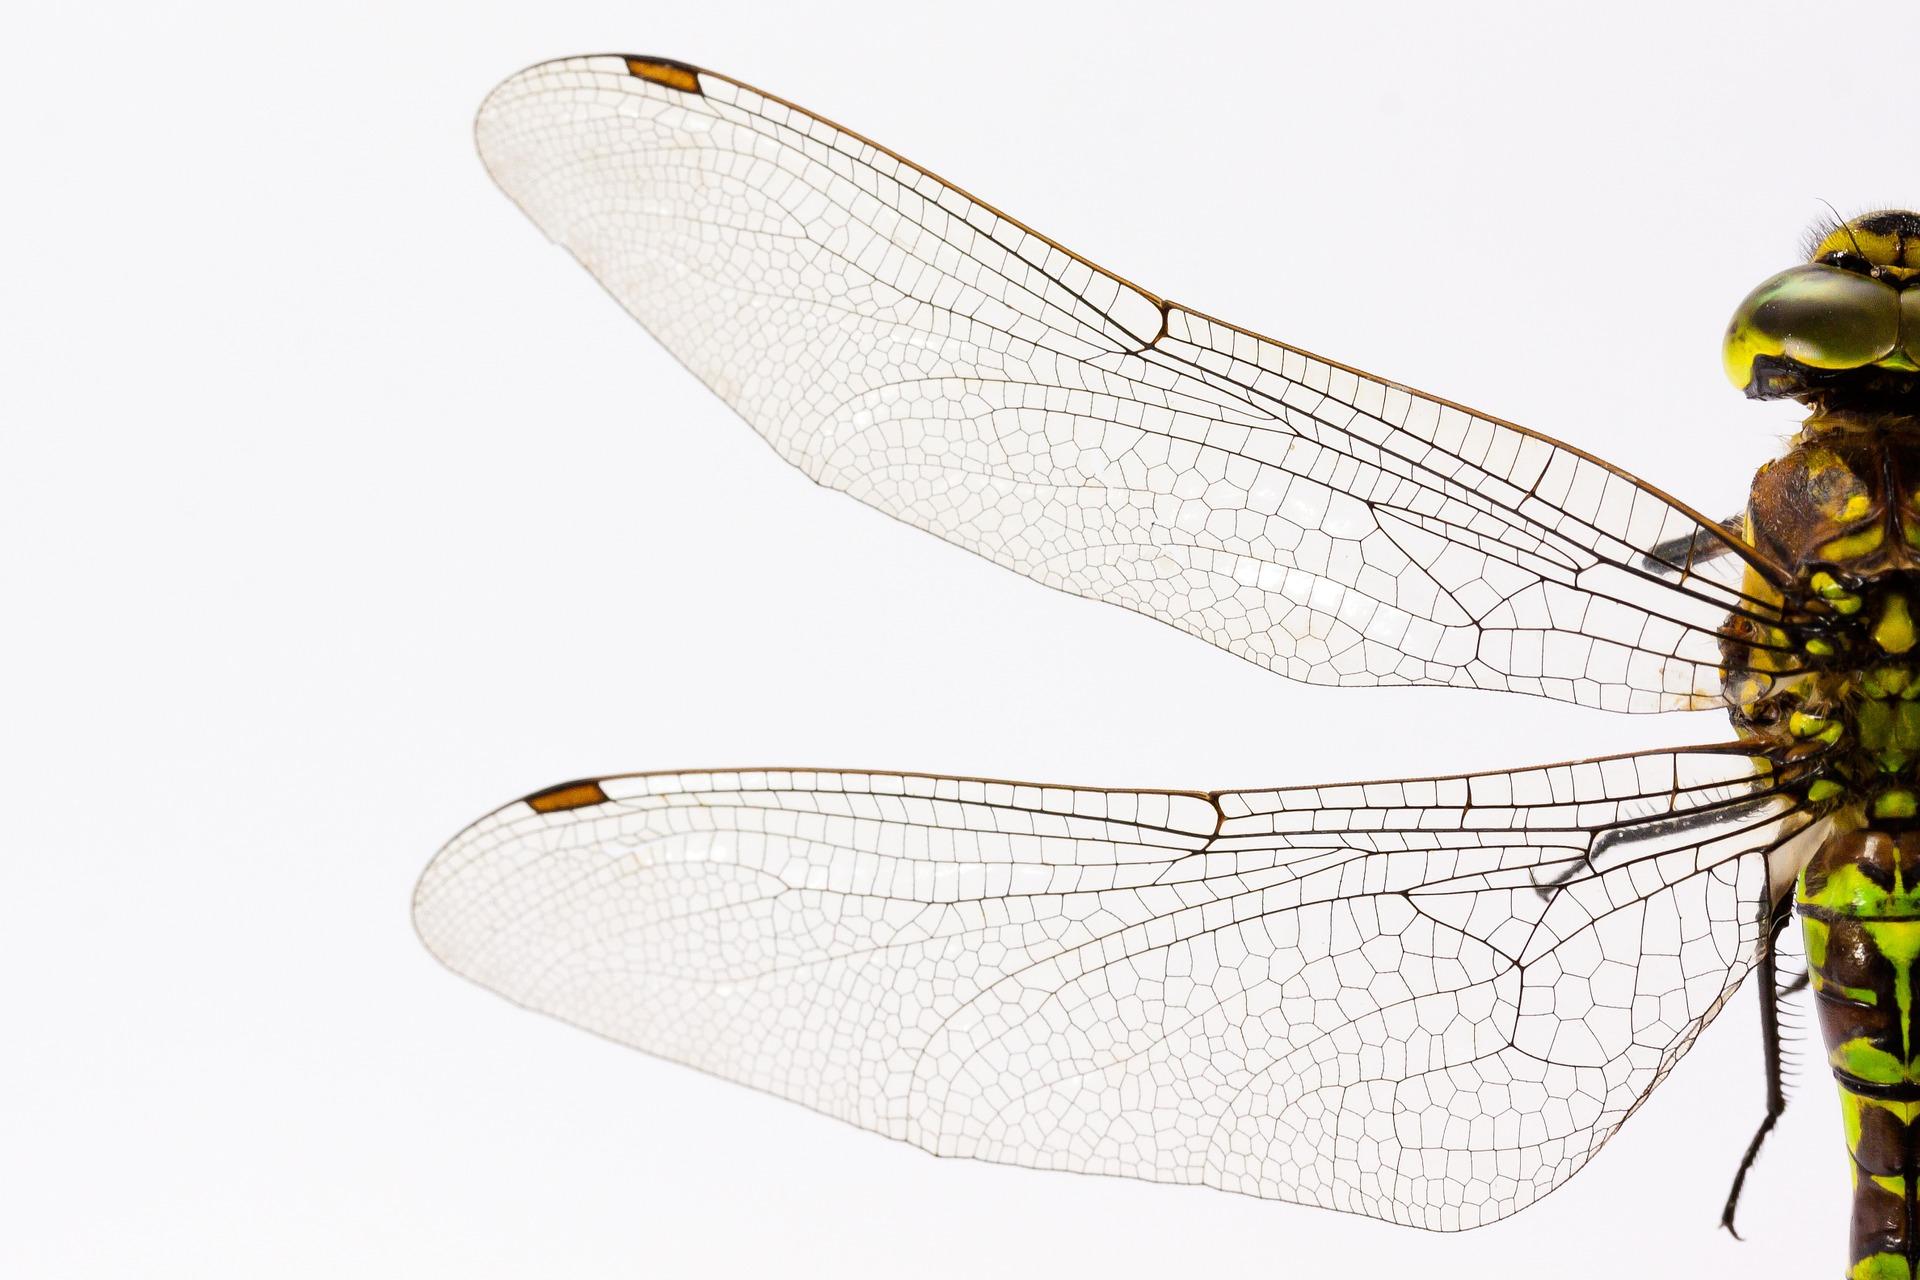 dragonfly-867888_1920.jpg